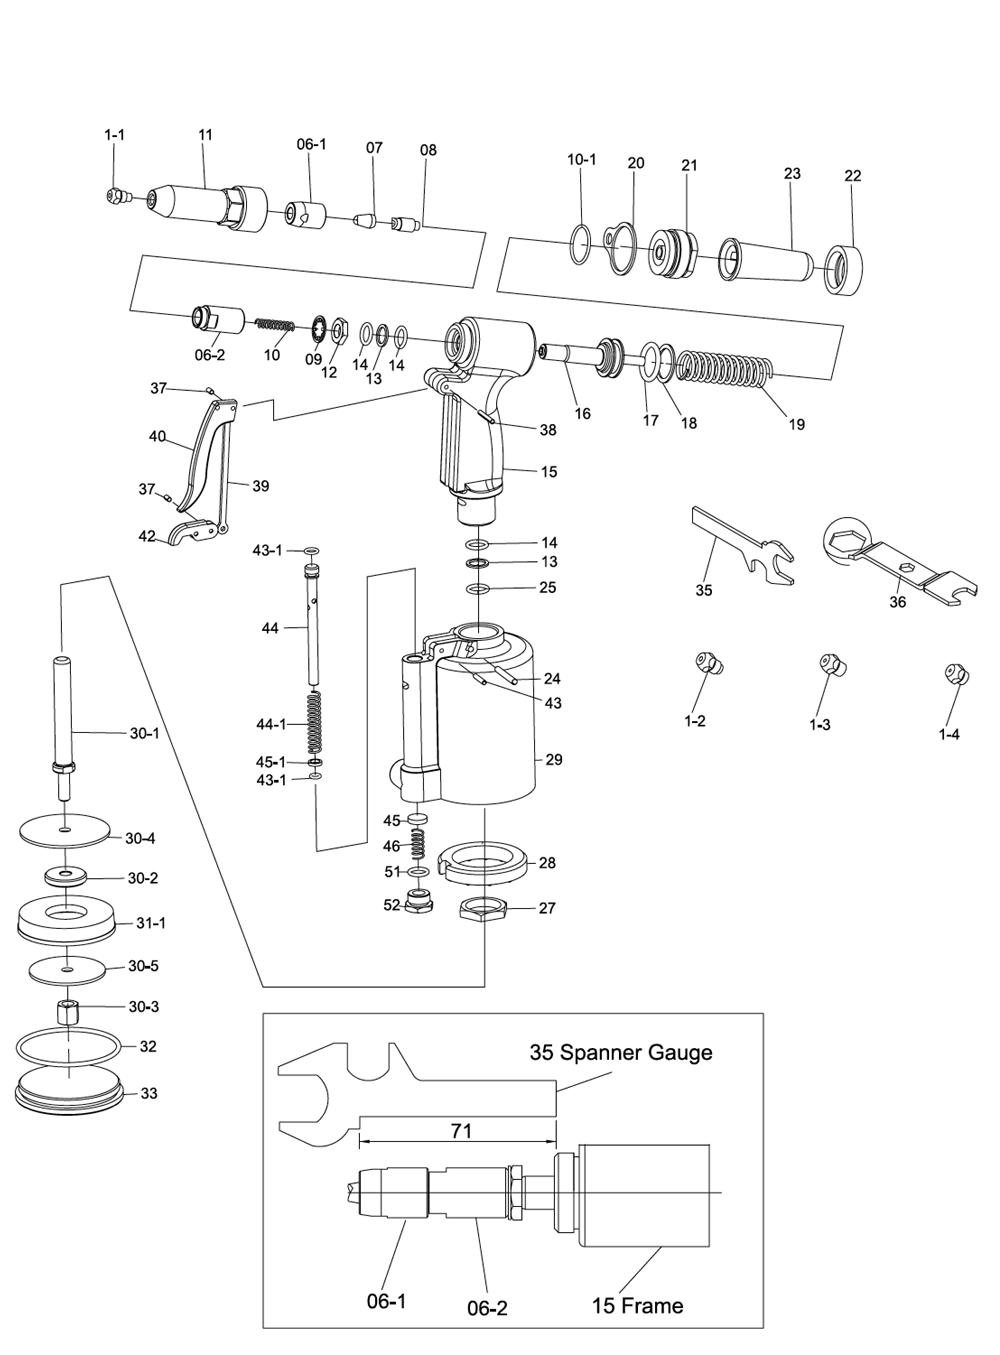 Pneumatic Counter Schematic Part : Chicago pneumatic cp parts list